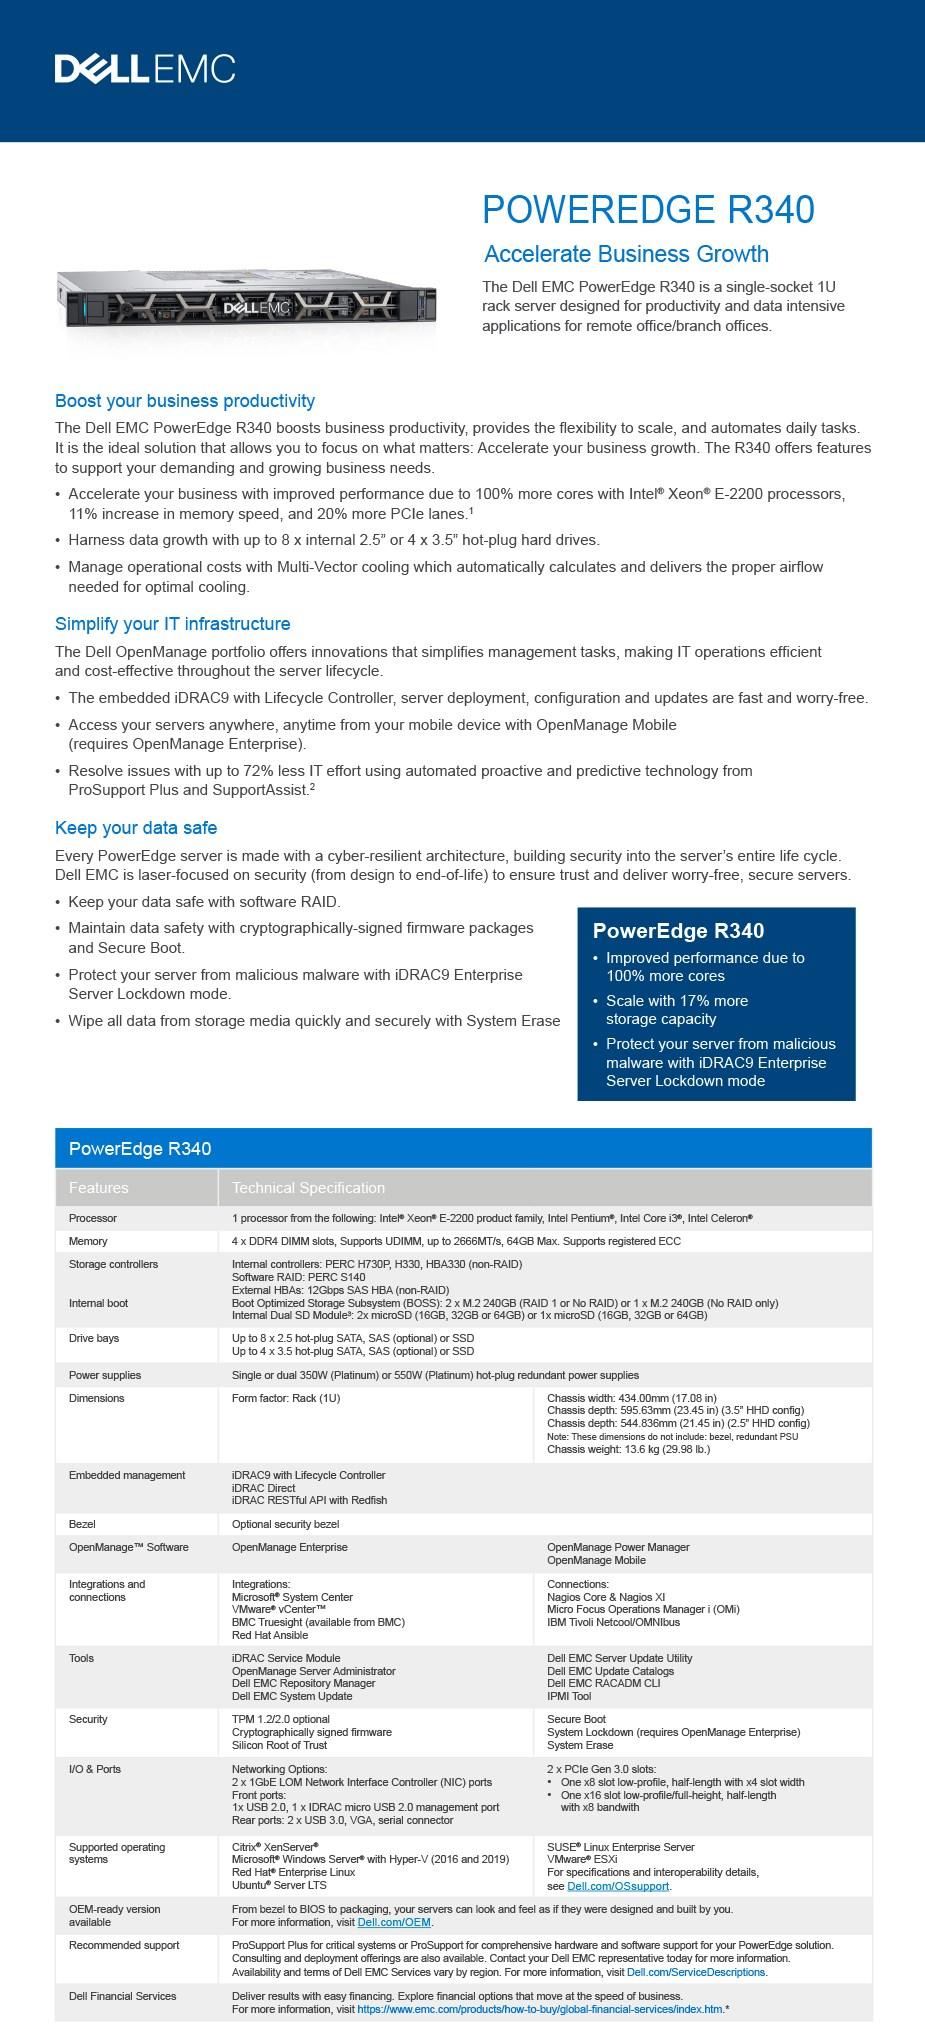 Dell PowerEdge R340 1U Rack Server Intel Xeon E-2224 8GB (1/4) 1TB (1/4) NO OS - Overview 1